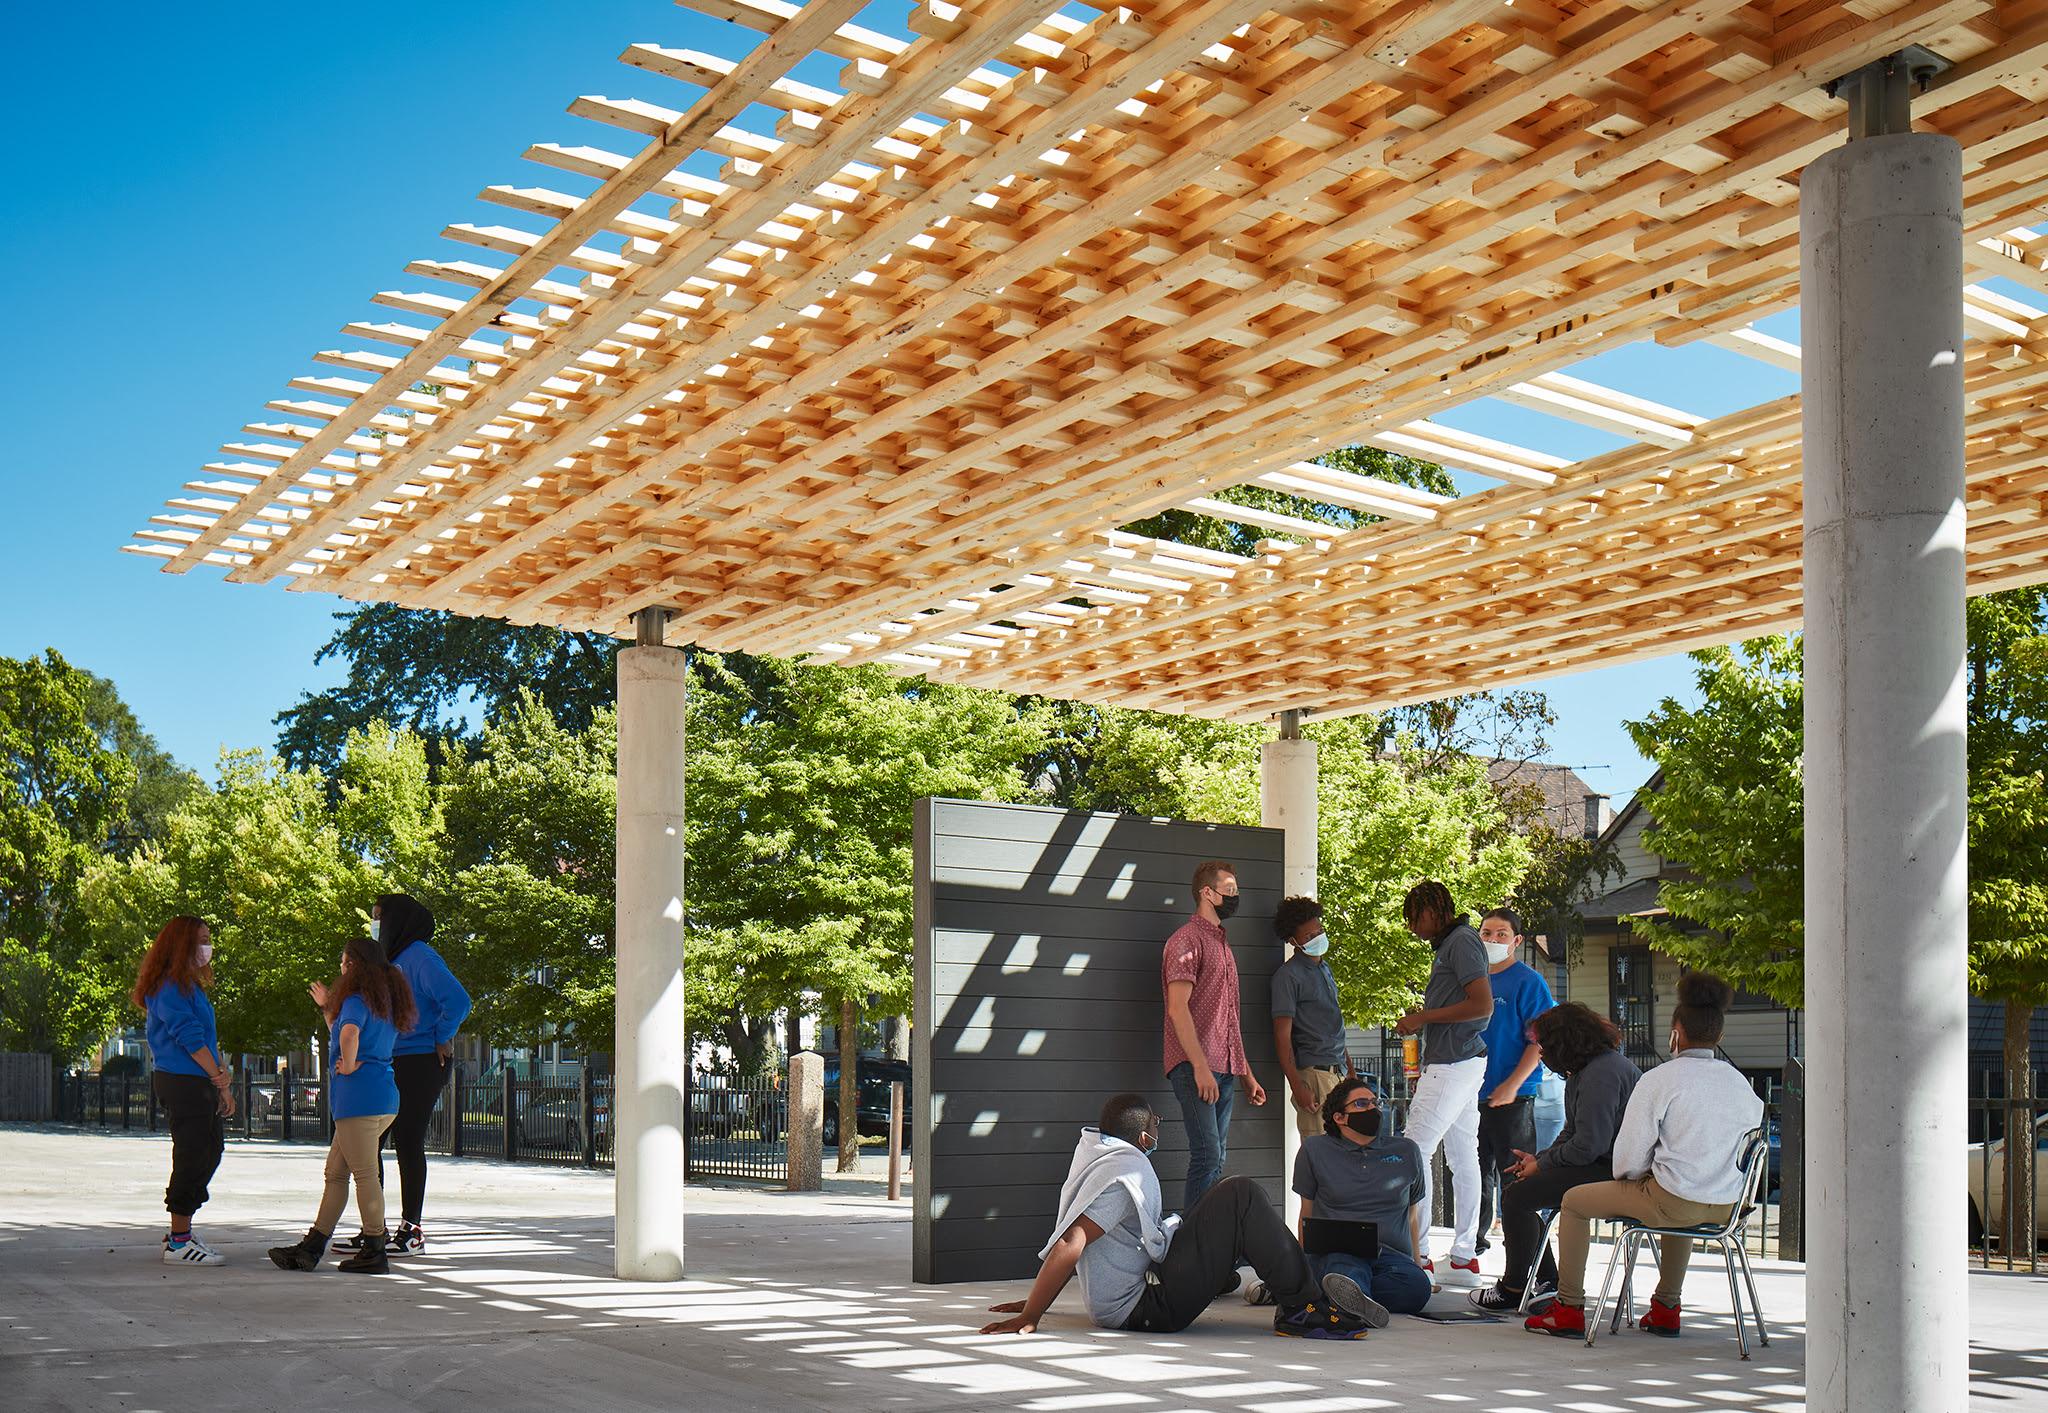 SPLAM Pavilion was built robotically using timber